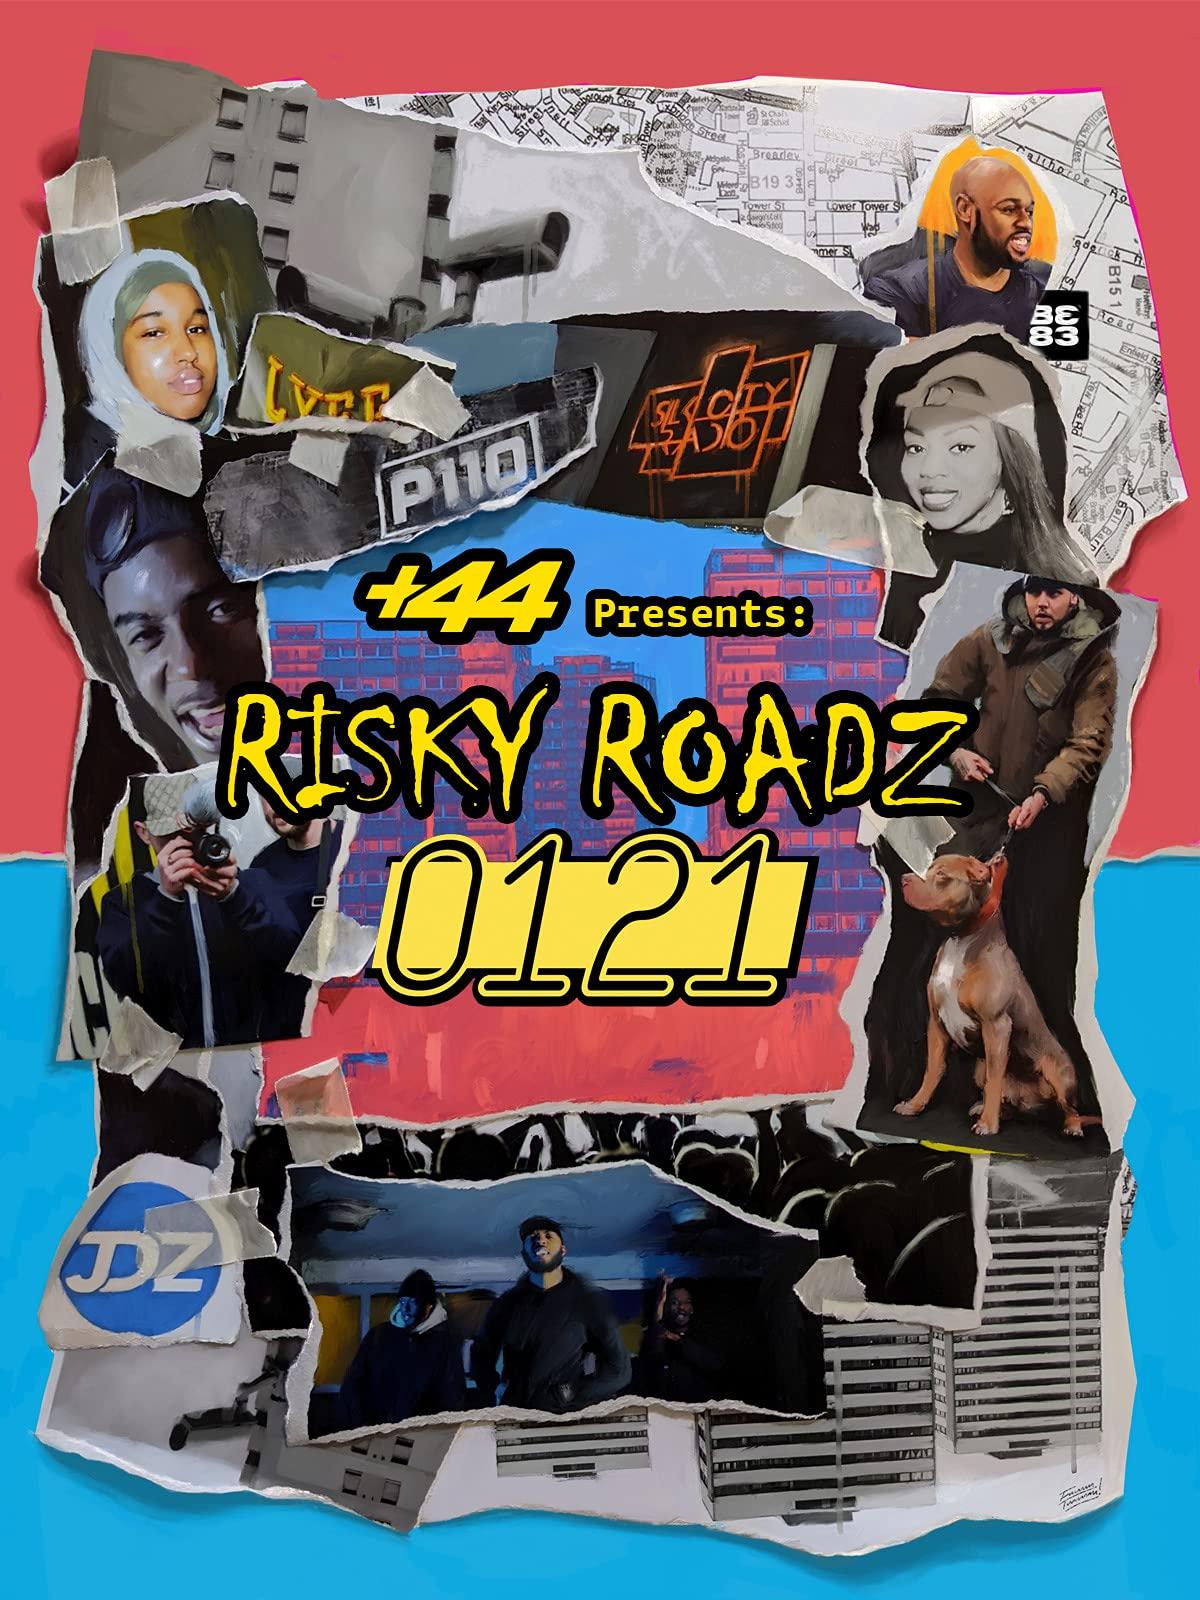 +44 Presents: Risky Roadz 0121